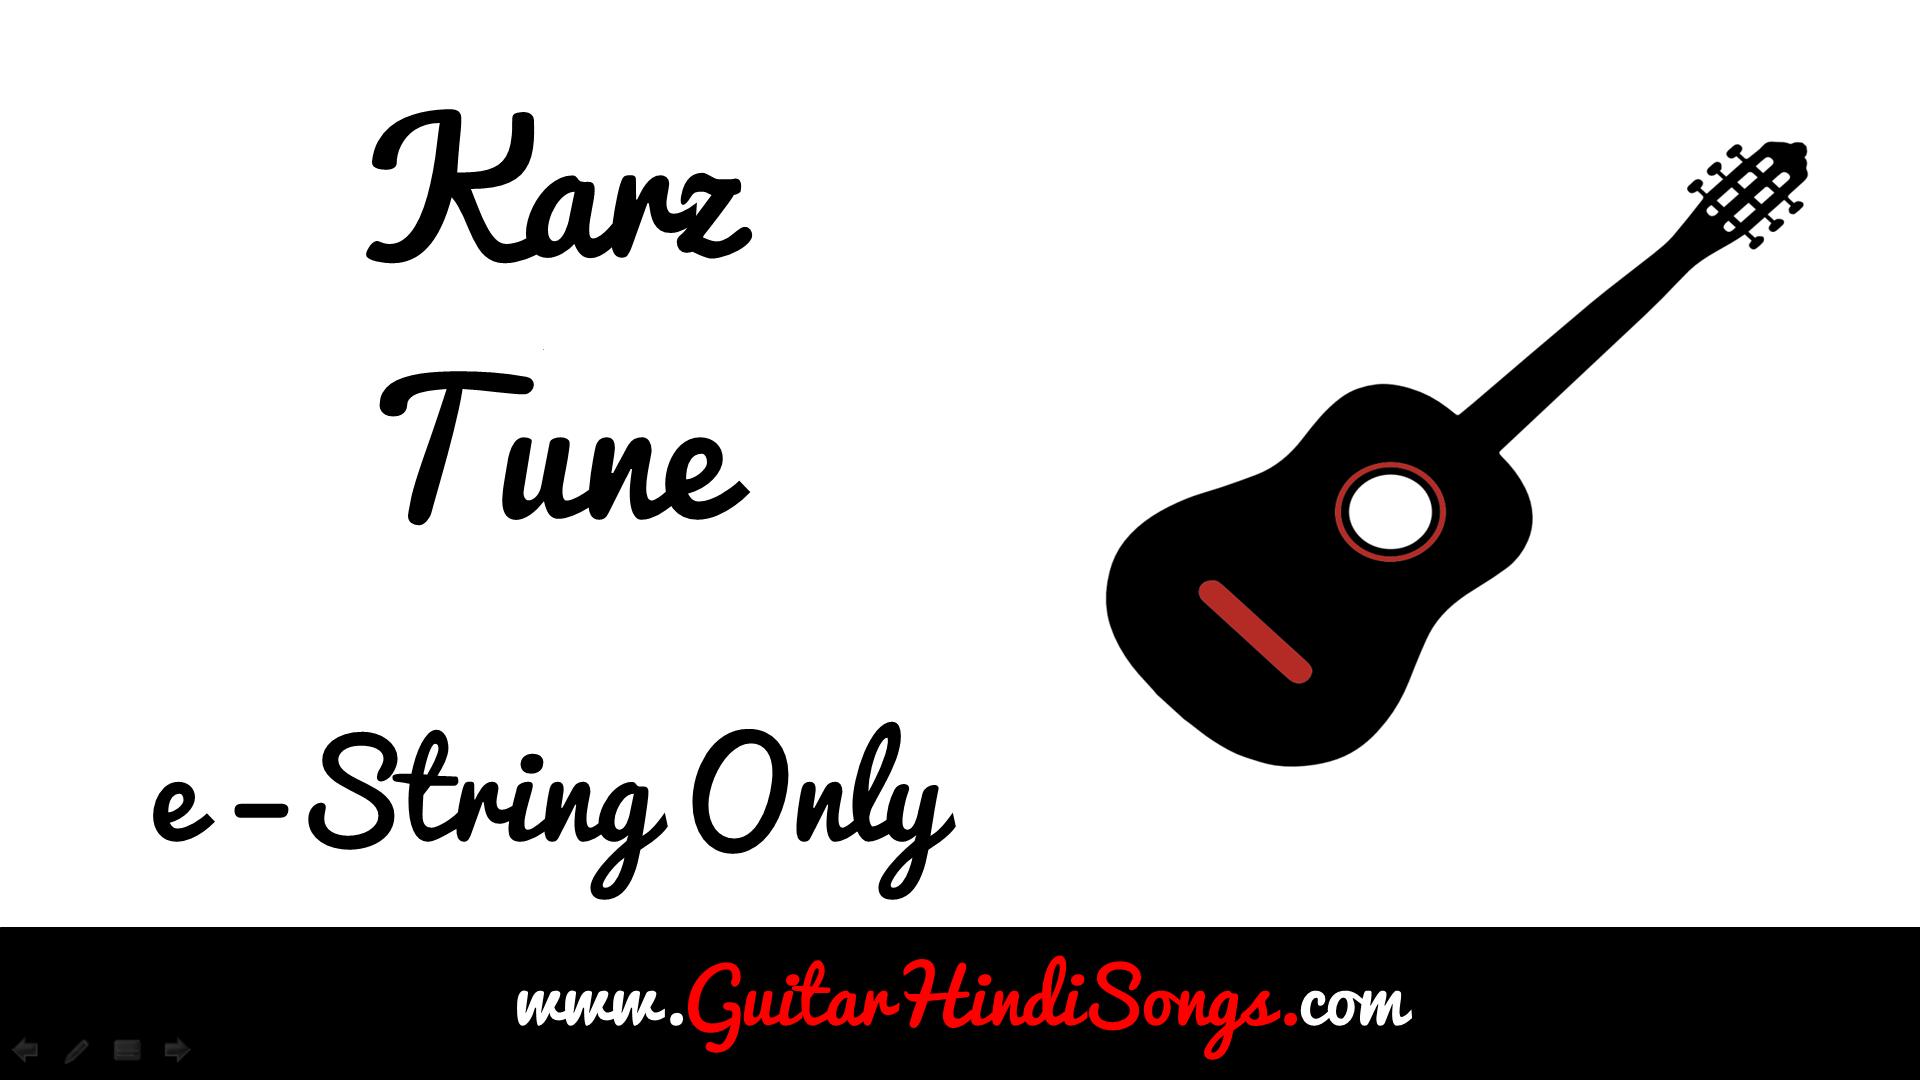 Karz Tune Guitar Tune Single String Guitar Hindi Songs Chand sifarish (fanna) single string guitar tabs. karz tune guitar tune single